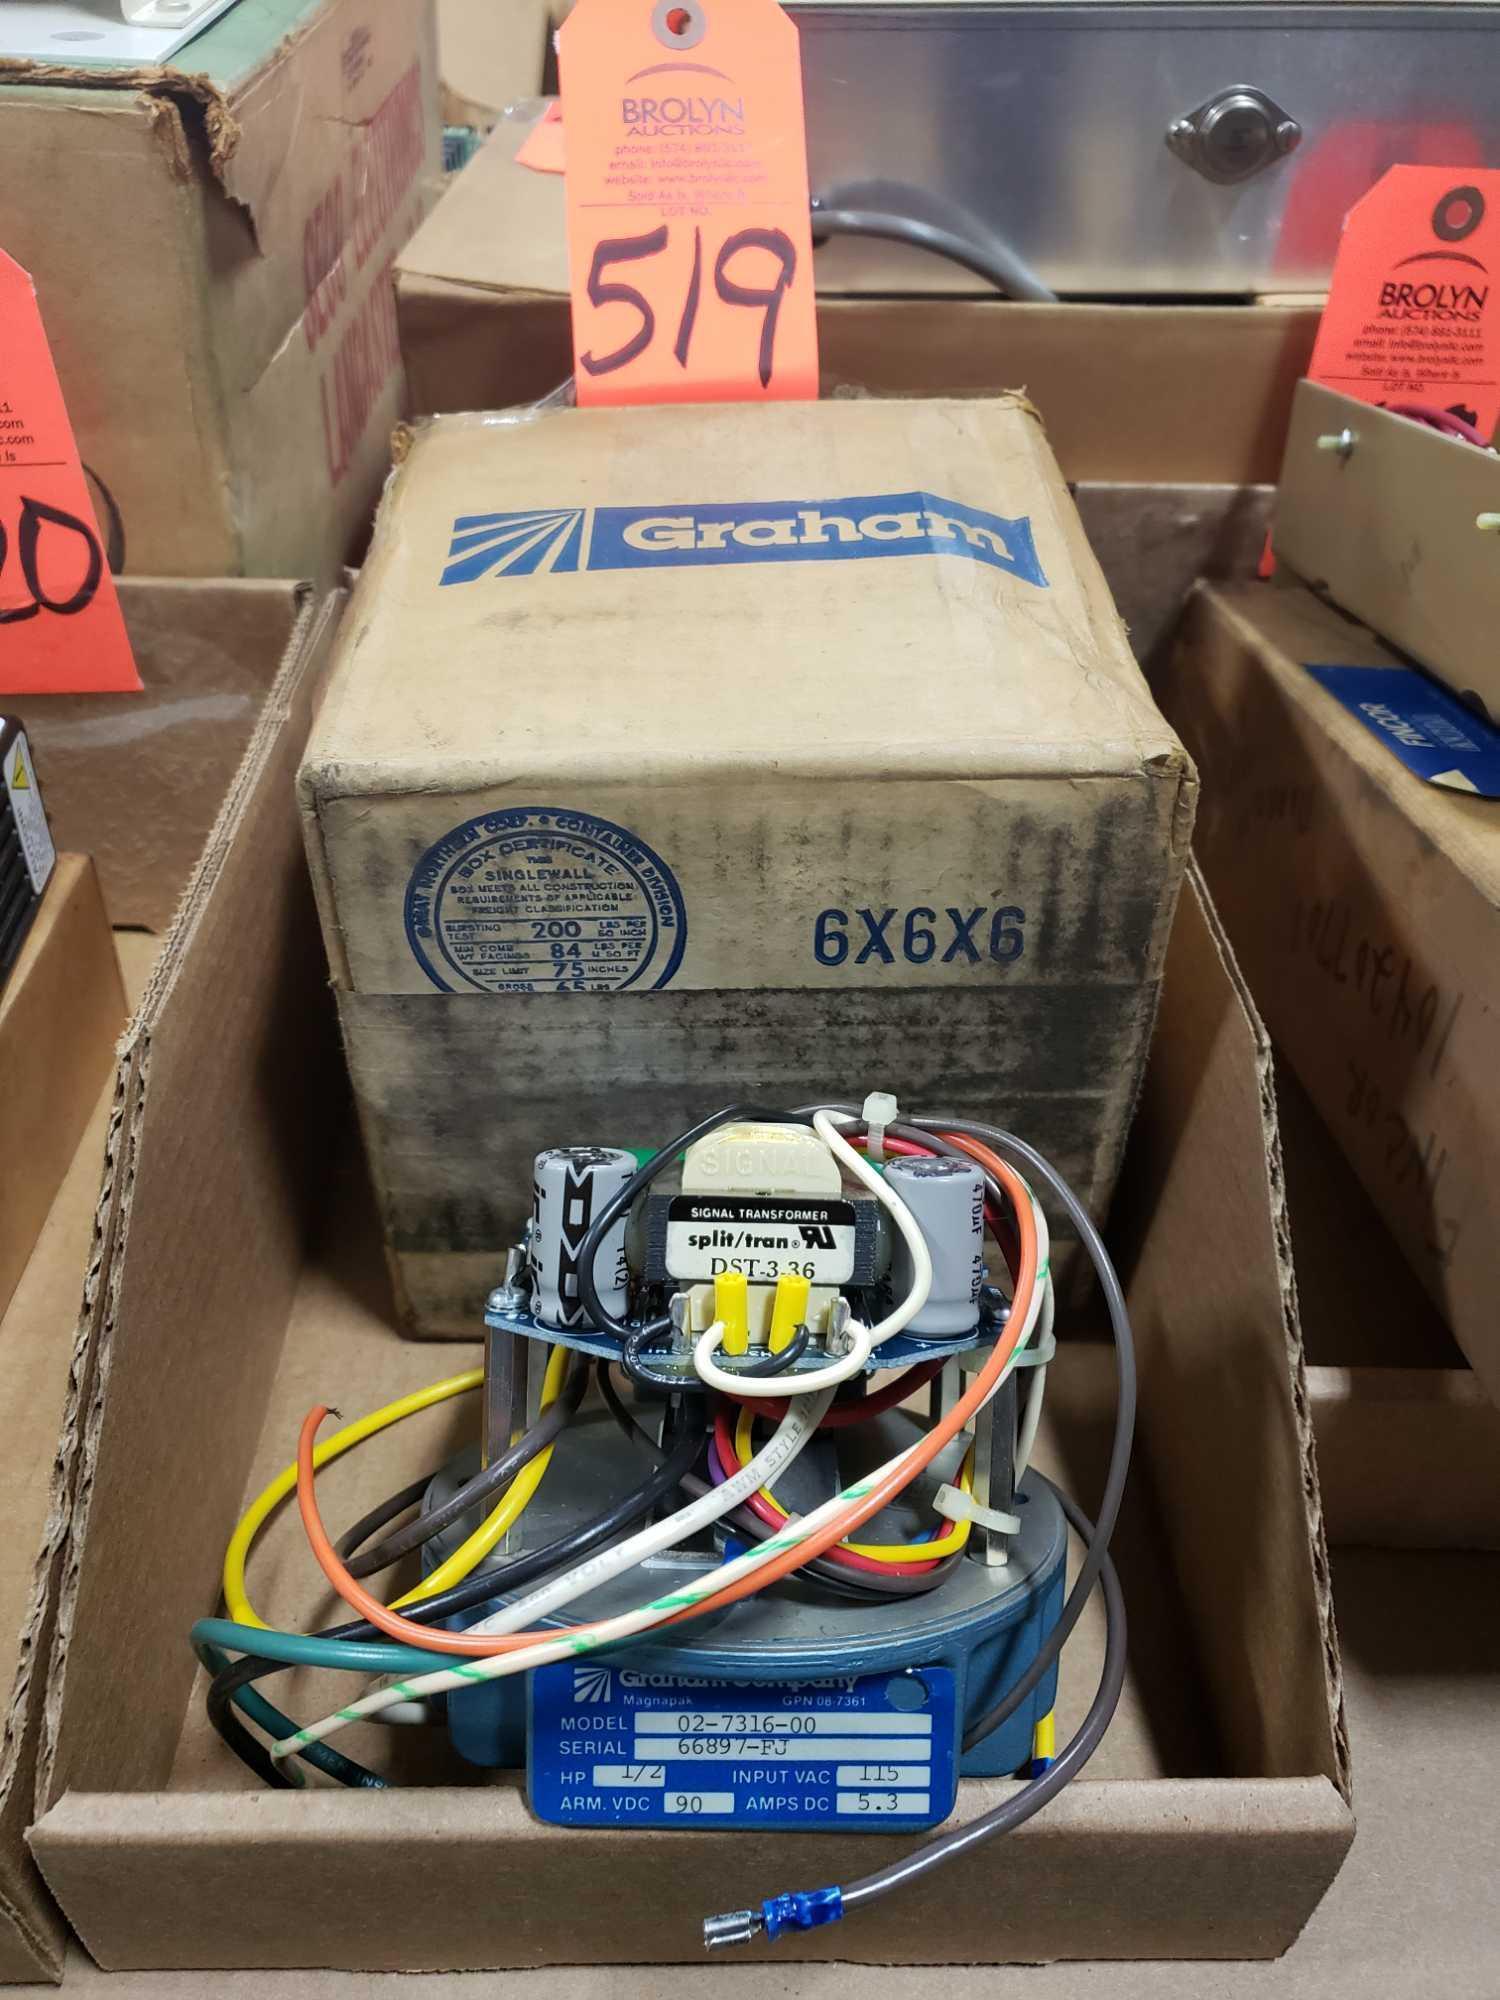 Graham Company Magnapak model 02-7316-00 1/2hp drive. New in box.